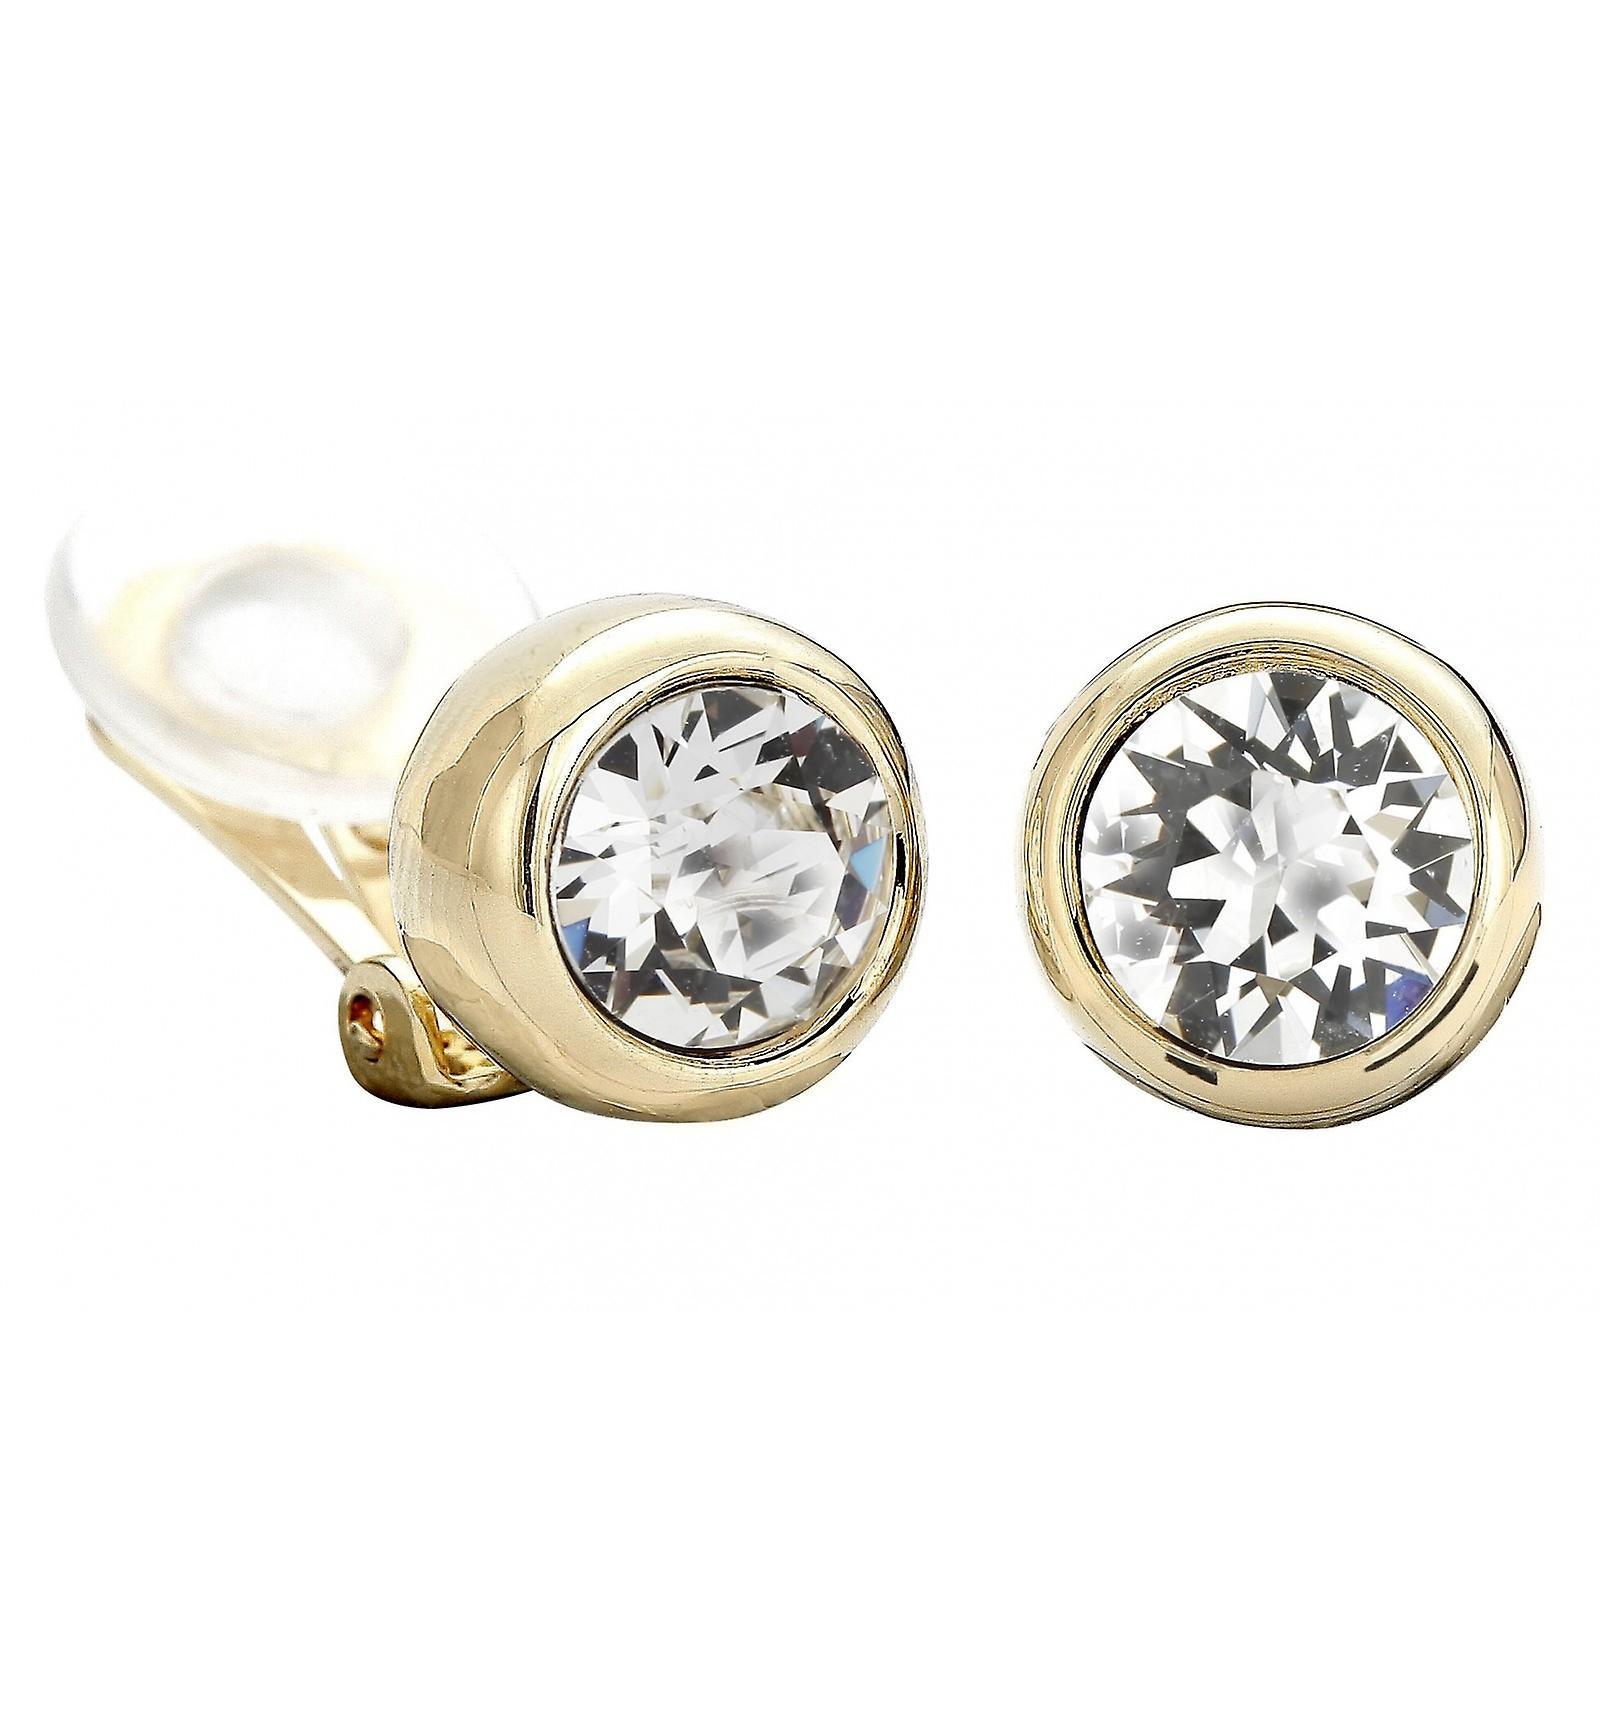 Reiziger clip Earring-22ct verguld-Swarovski kristallen-156240